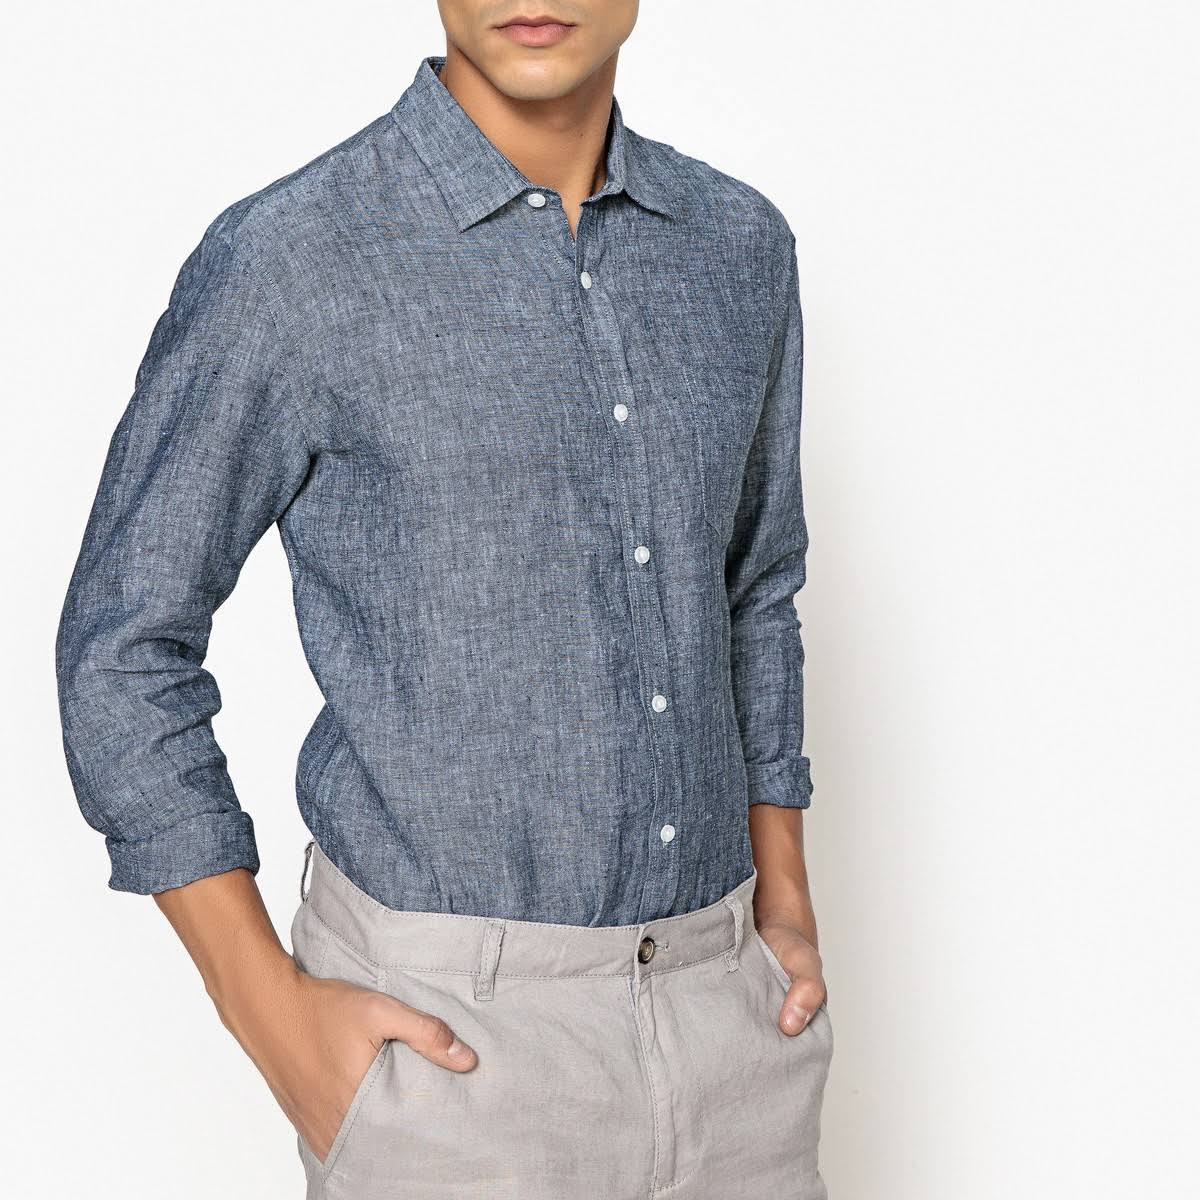 Fundas Cru Regular Lino En Redoute La Camisa P5H66q